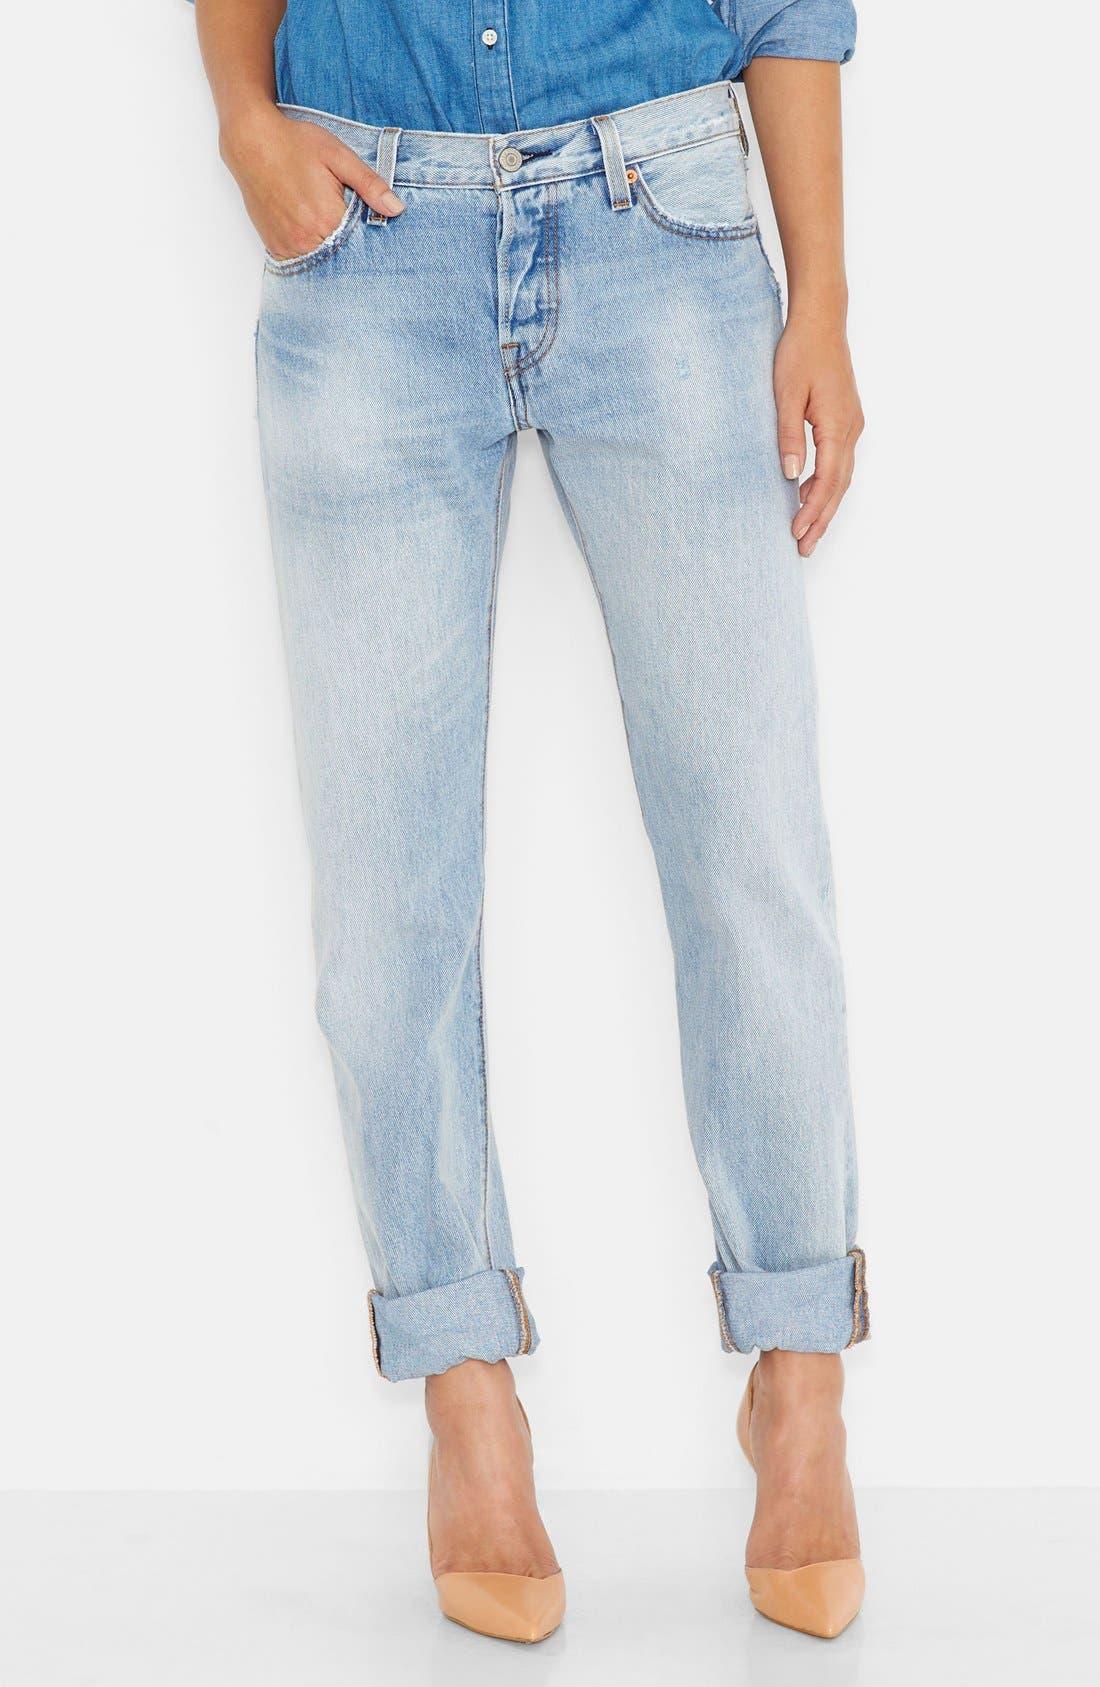 LEVI'S<SUP>®</SUP>, '501<sup>®</sup>' Jeans, Main thumbnail 1, color, 400